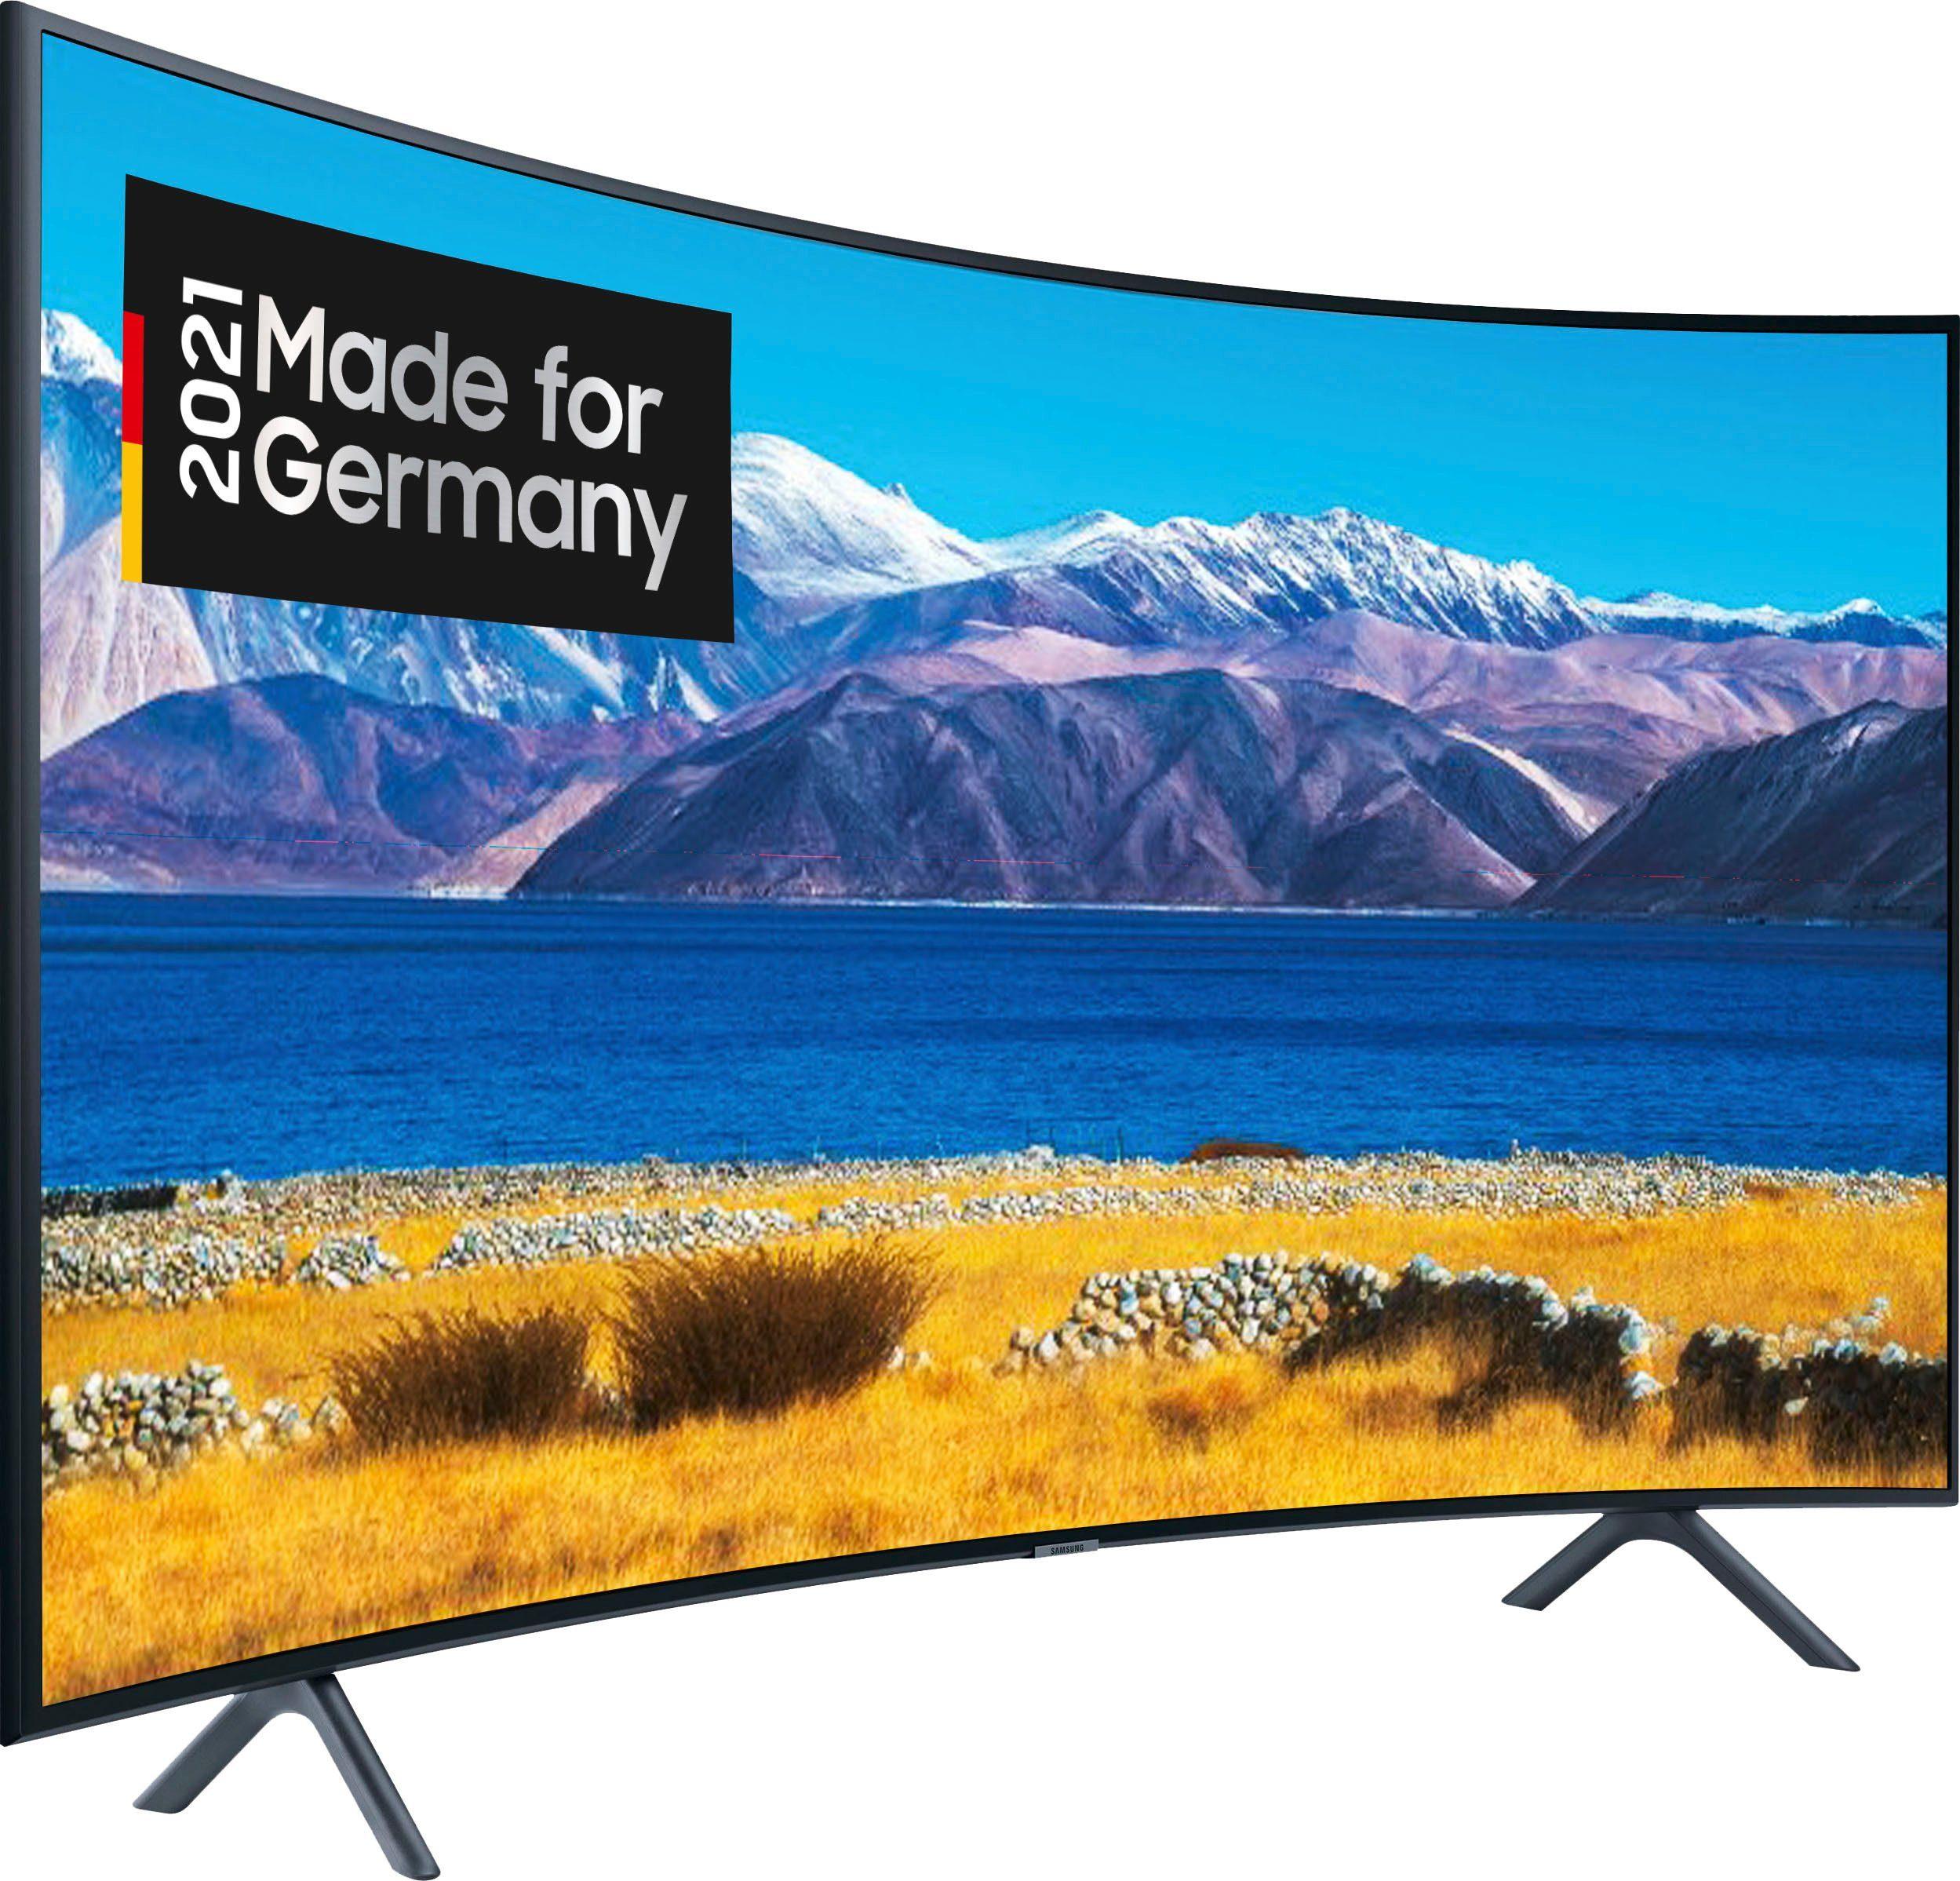 samsung gu65tu8379u curved led fernseher 163 cm 65 zoll 4k ultra hd smart tv hd integriert 6 monate gratis